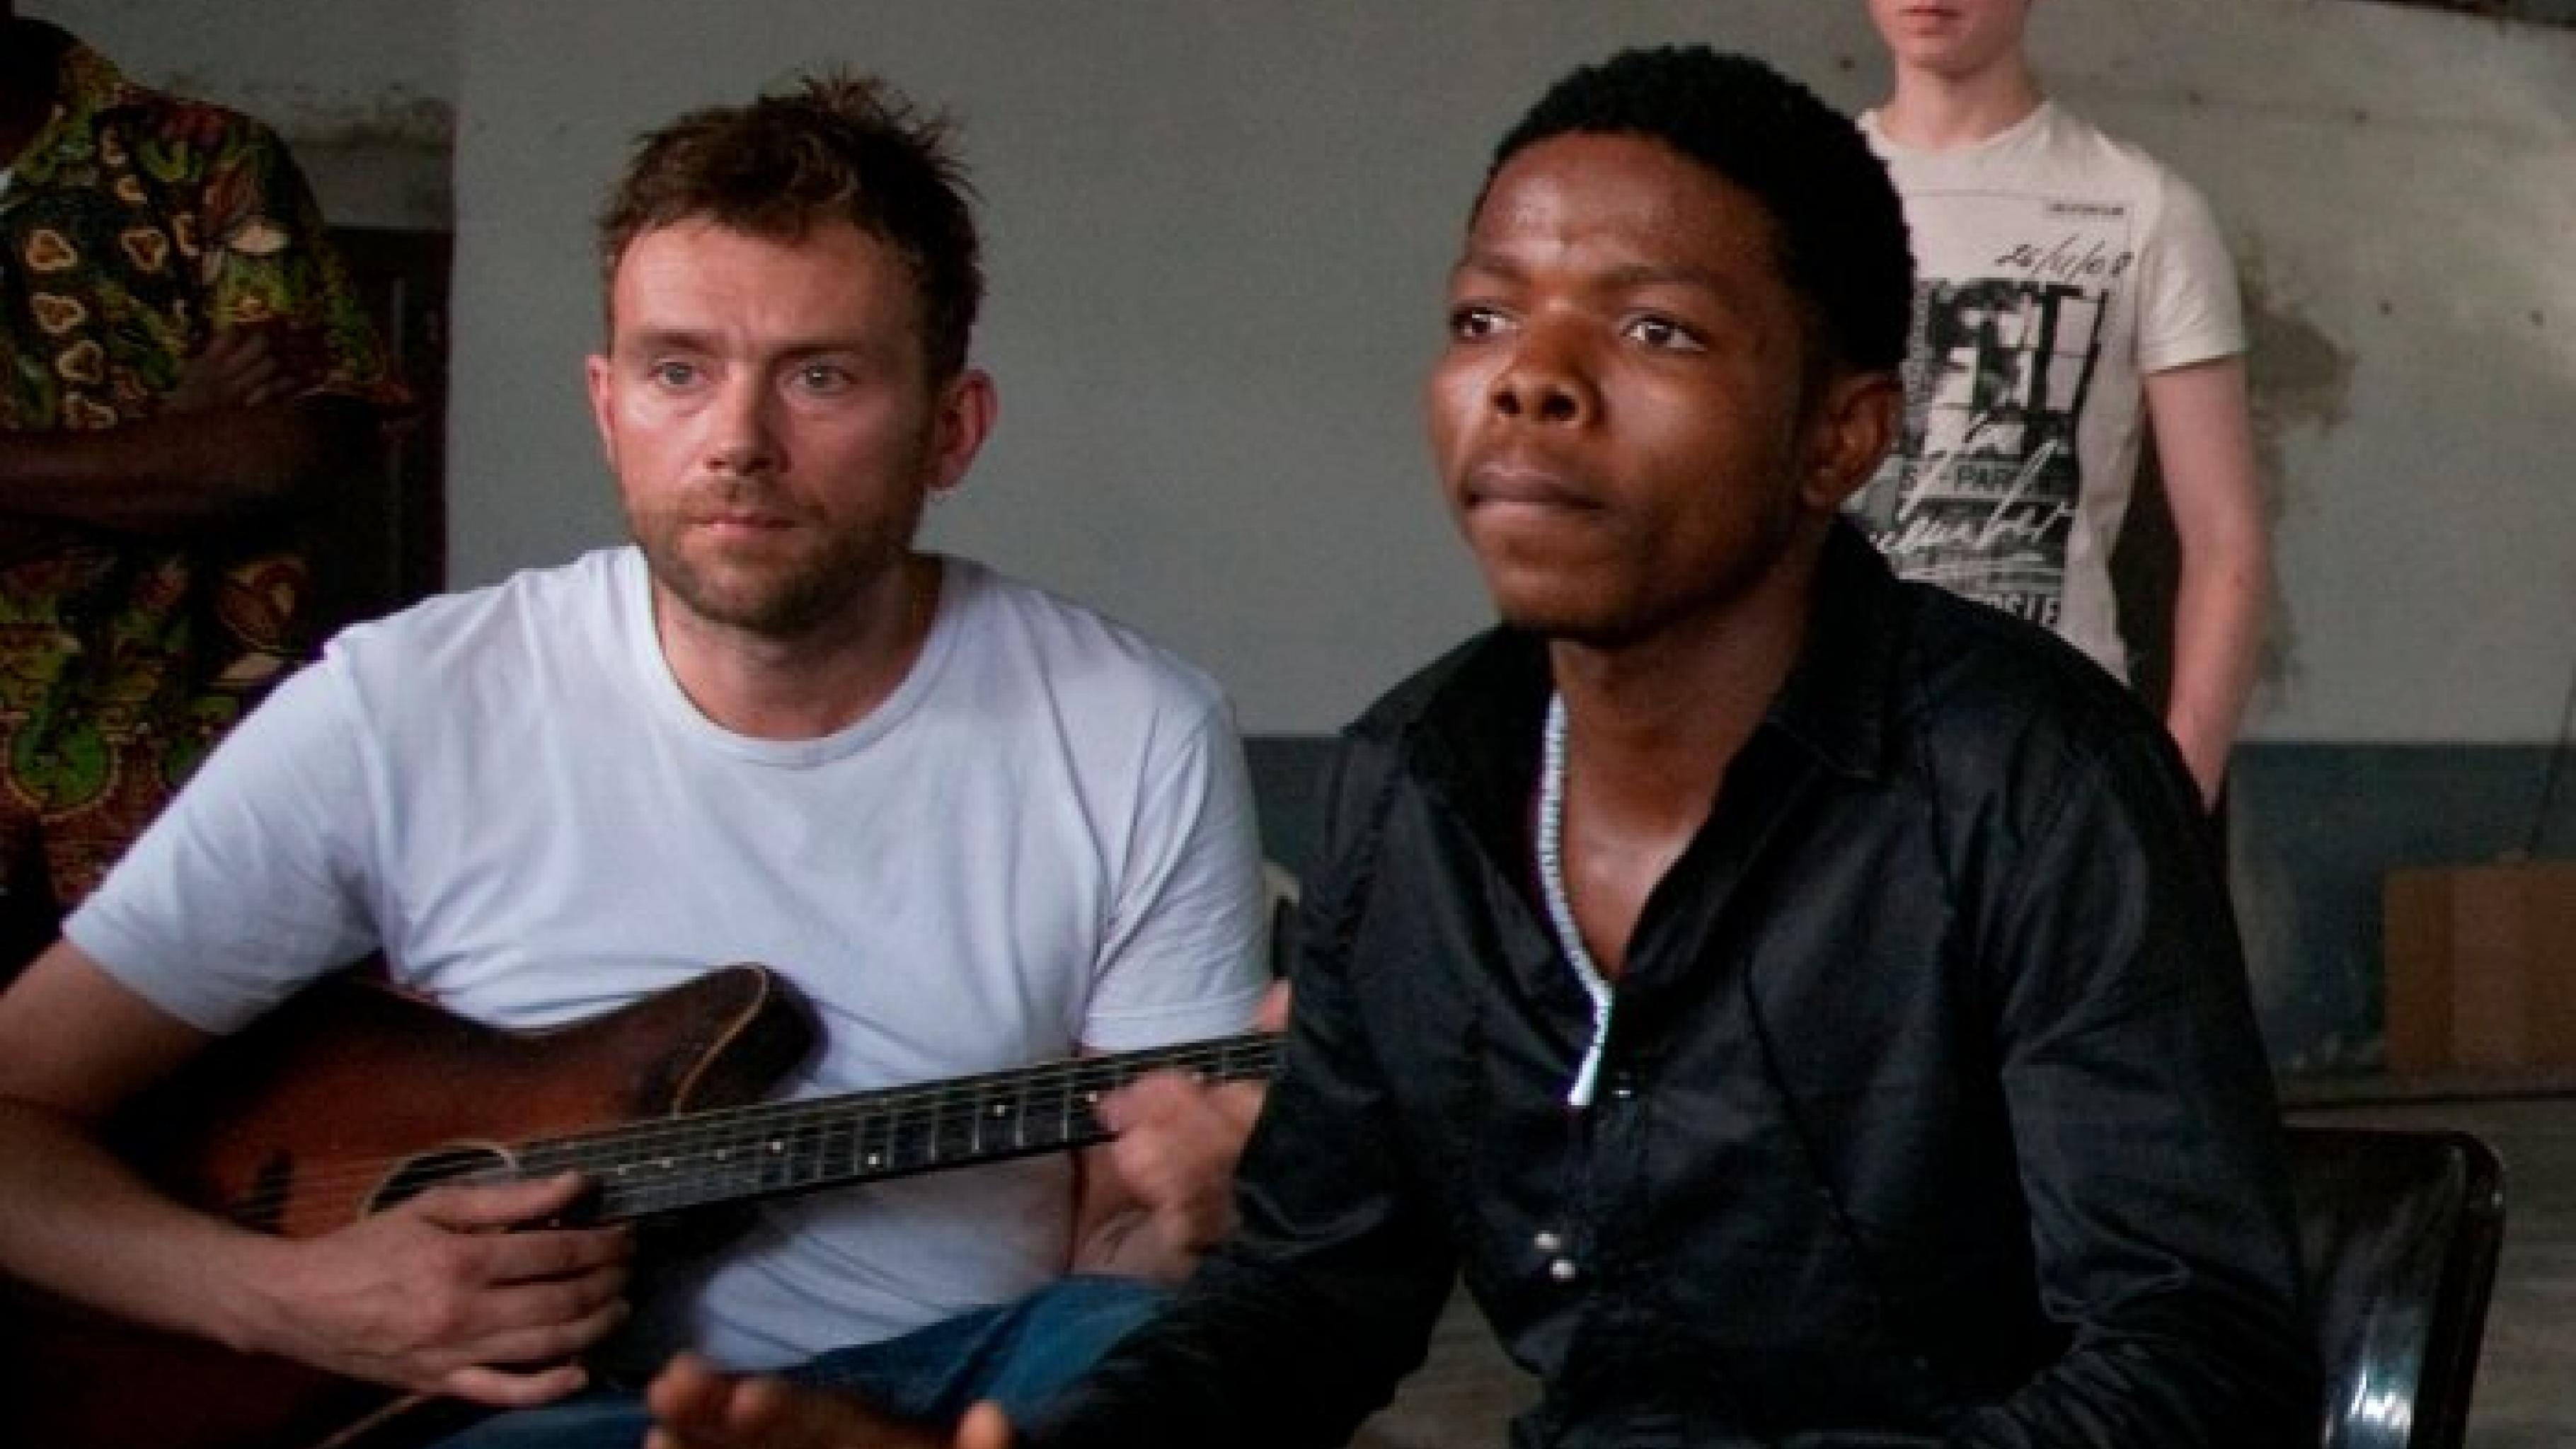 Damon Albarn (li.) bei Aufnahmen in Kinshasa